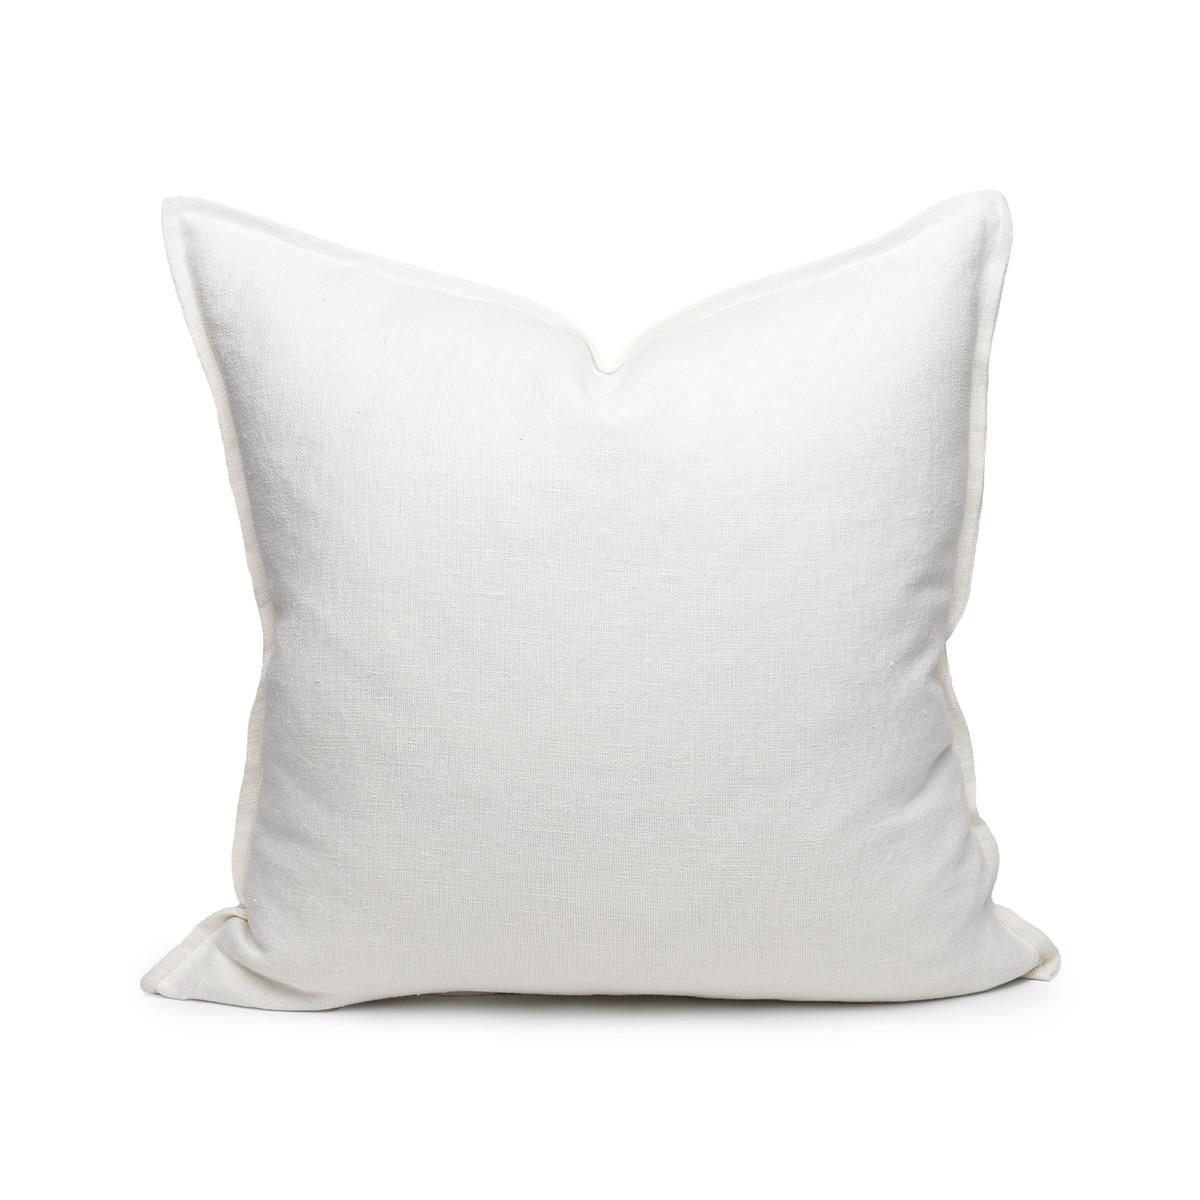 Simone PURE LINEN pillow White - front